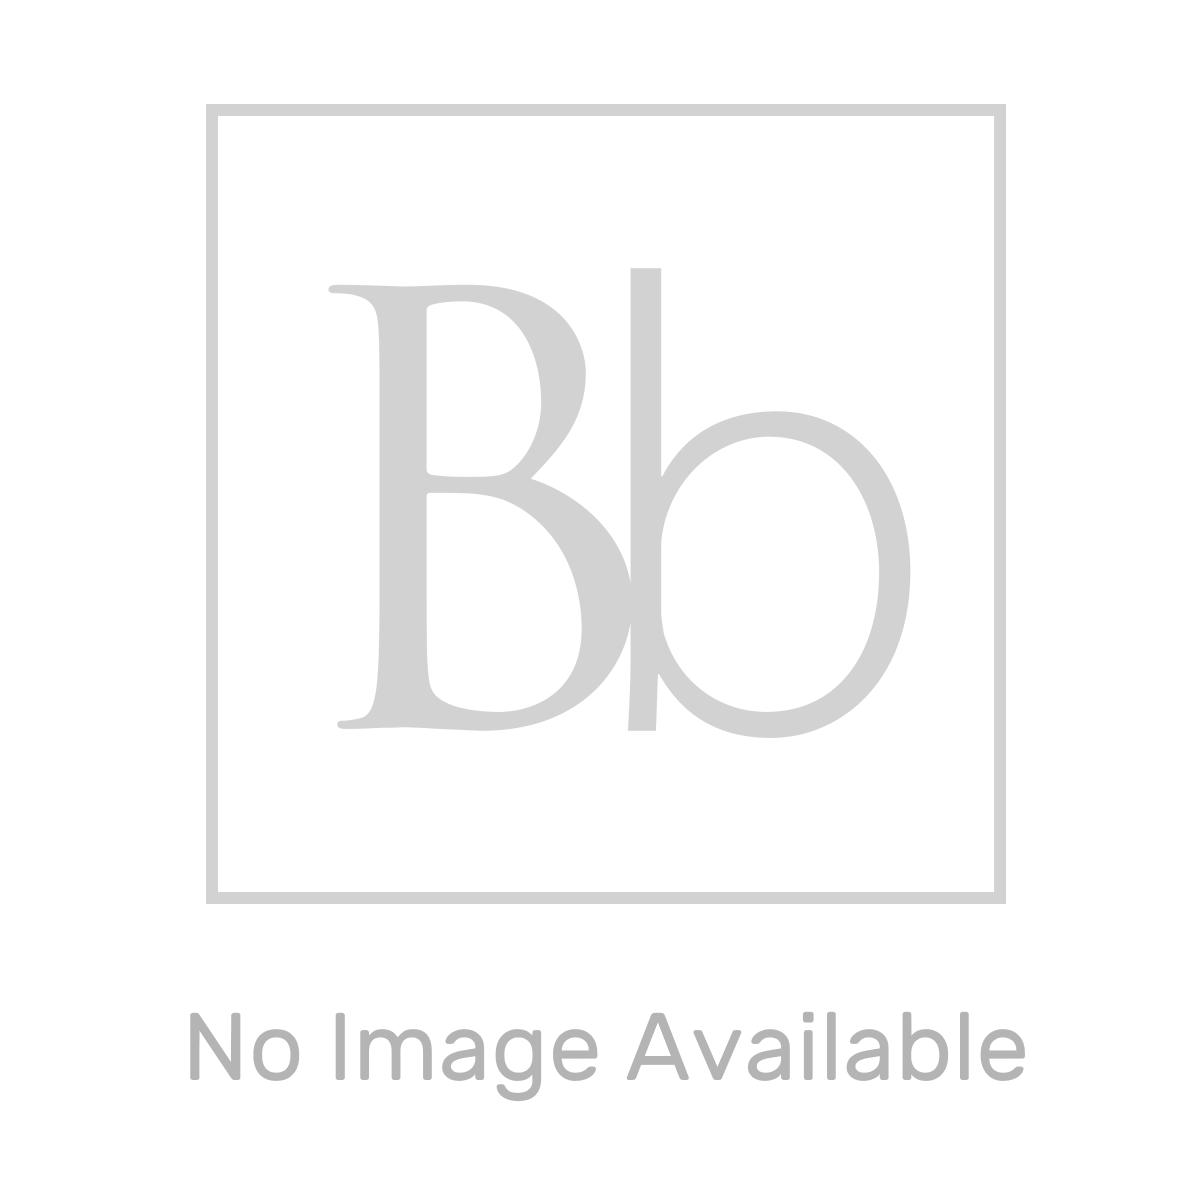 Zenith 550 Series Gloss White Vanity Unit